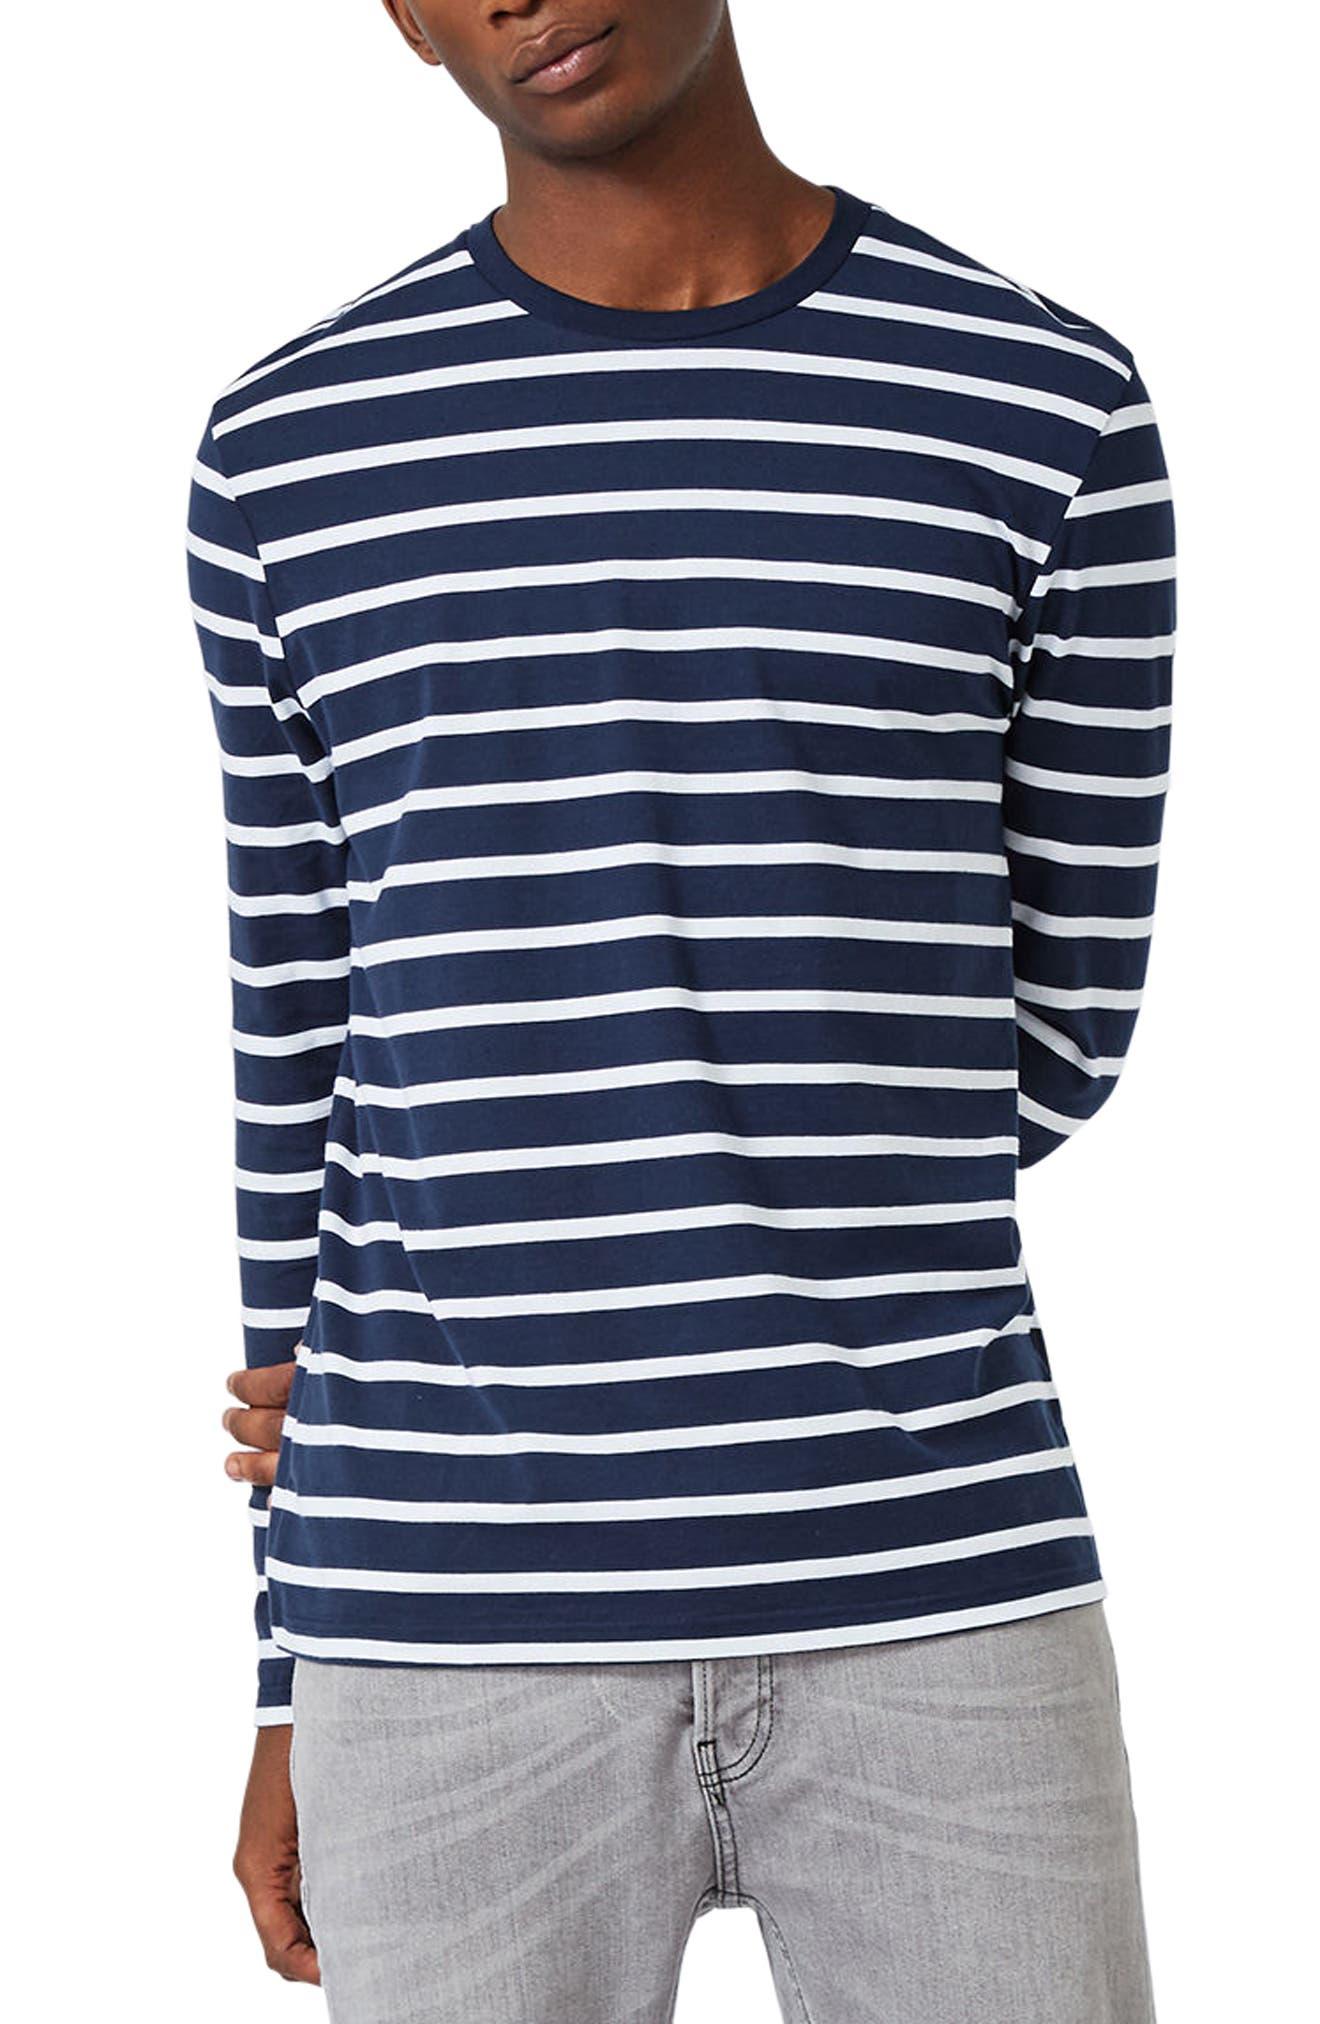 Topman Stripe Slim Fit Long Sleeve T-Shirt